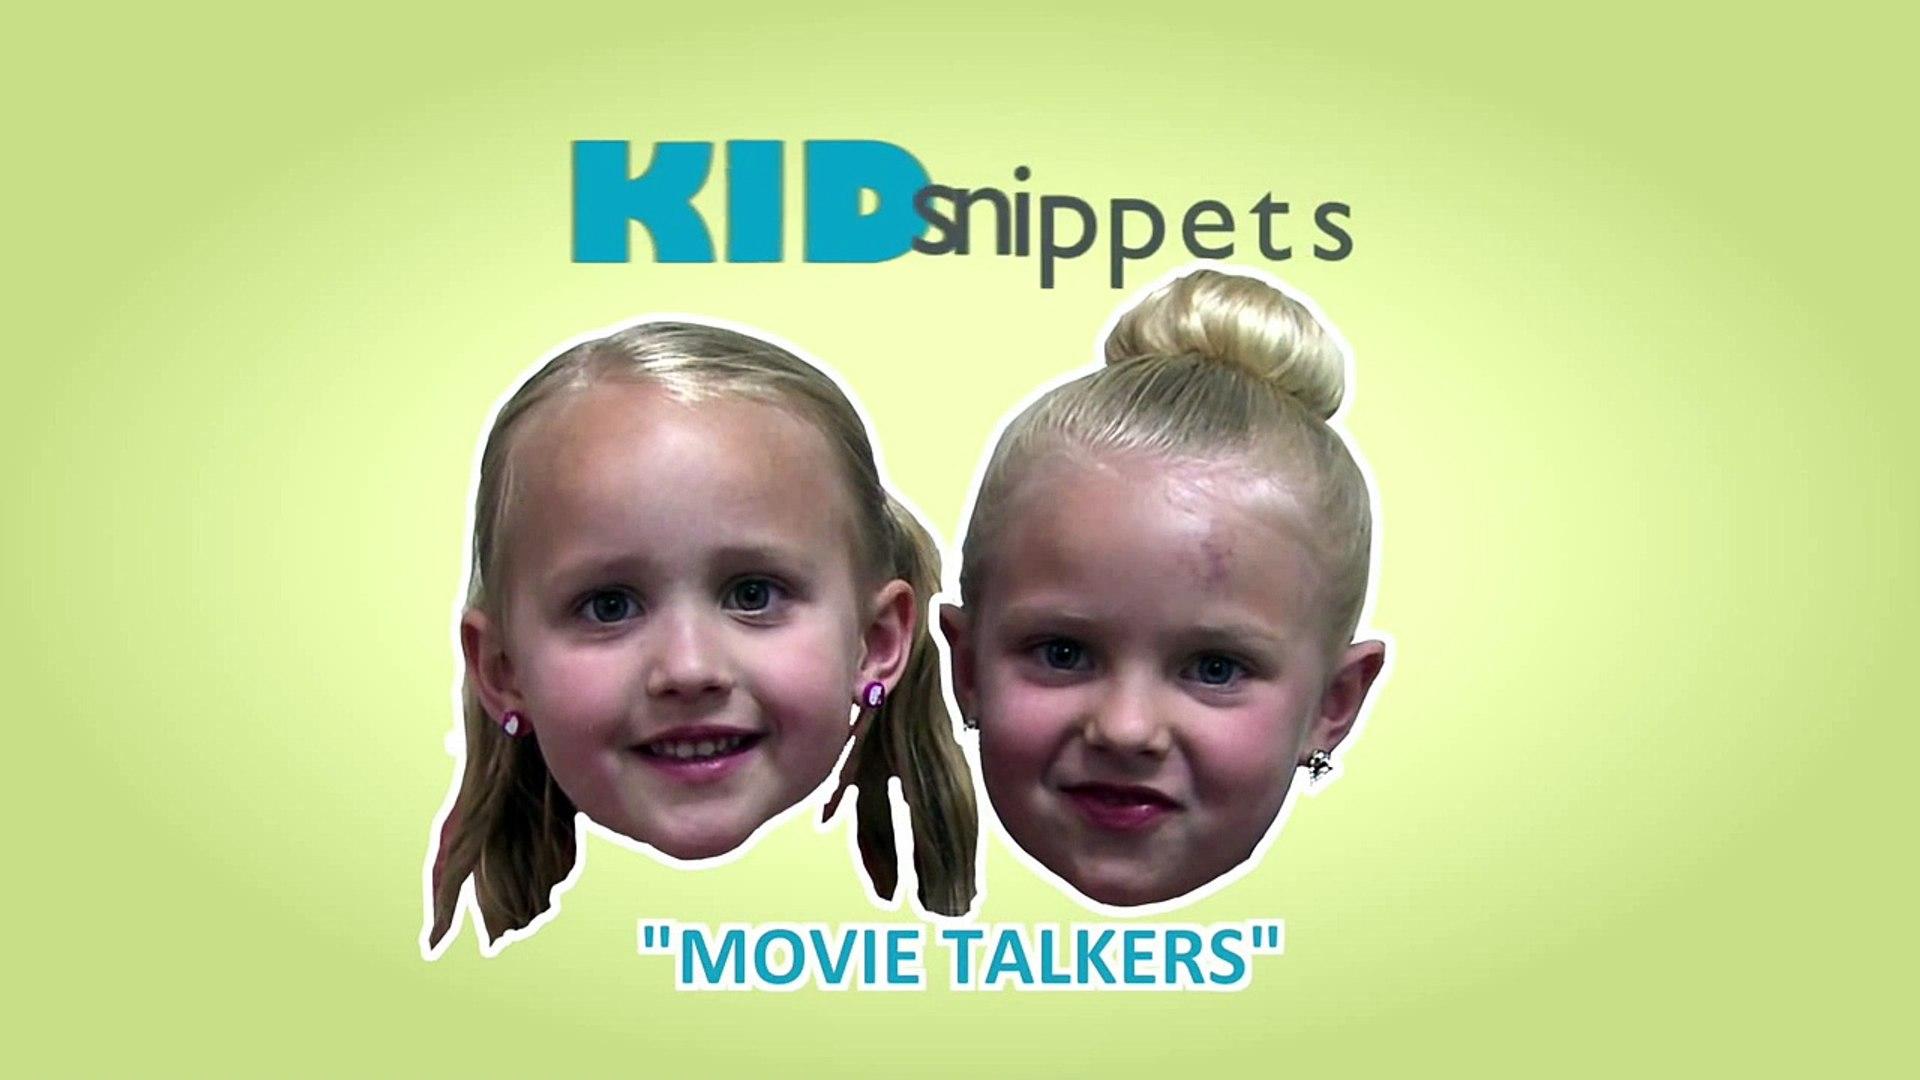 Movie Talkers - Kid Snippets